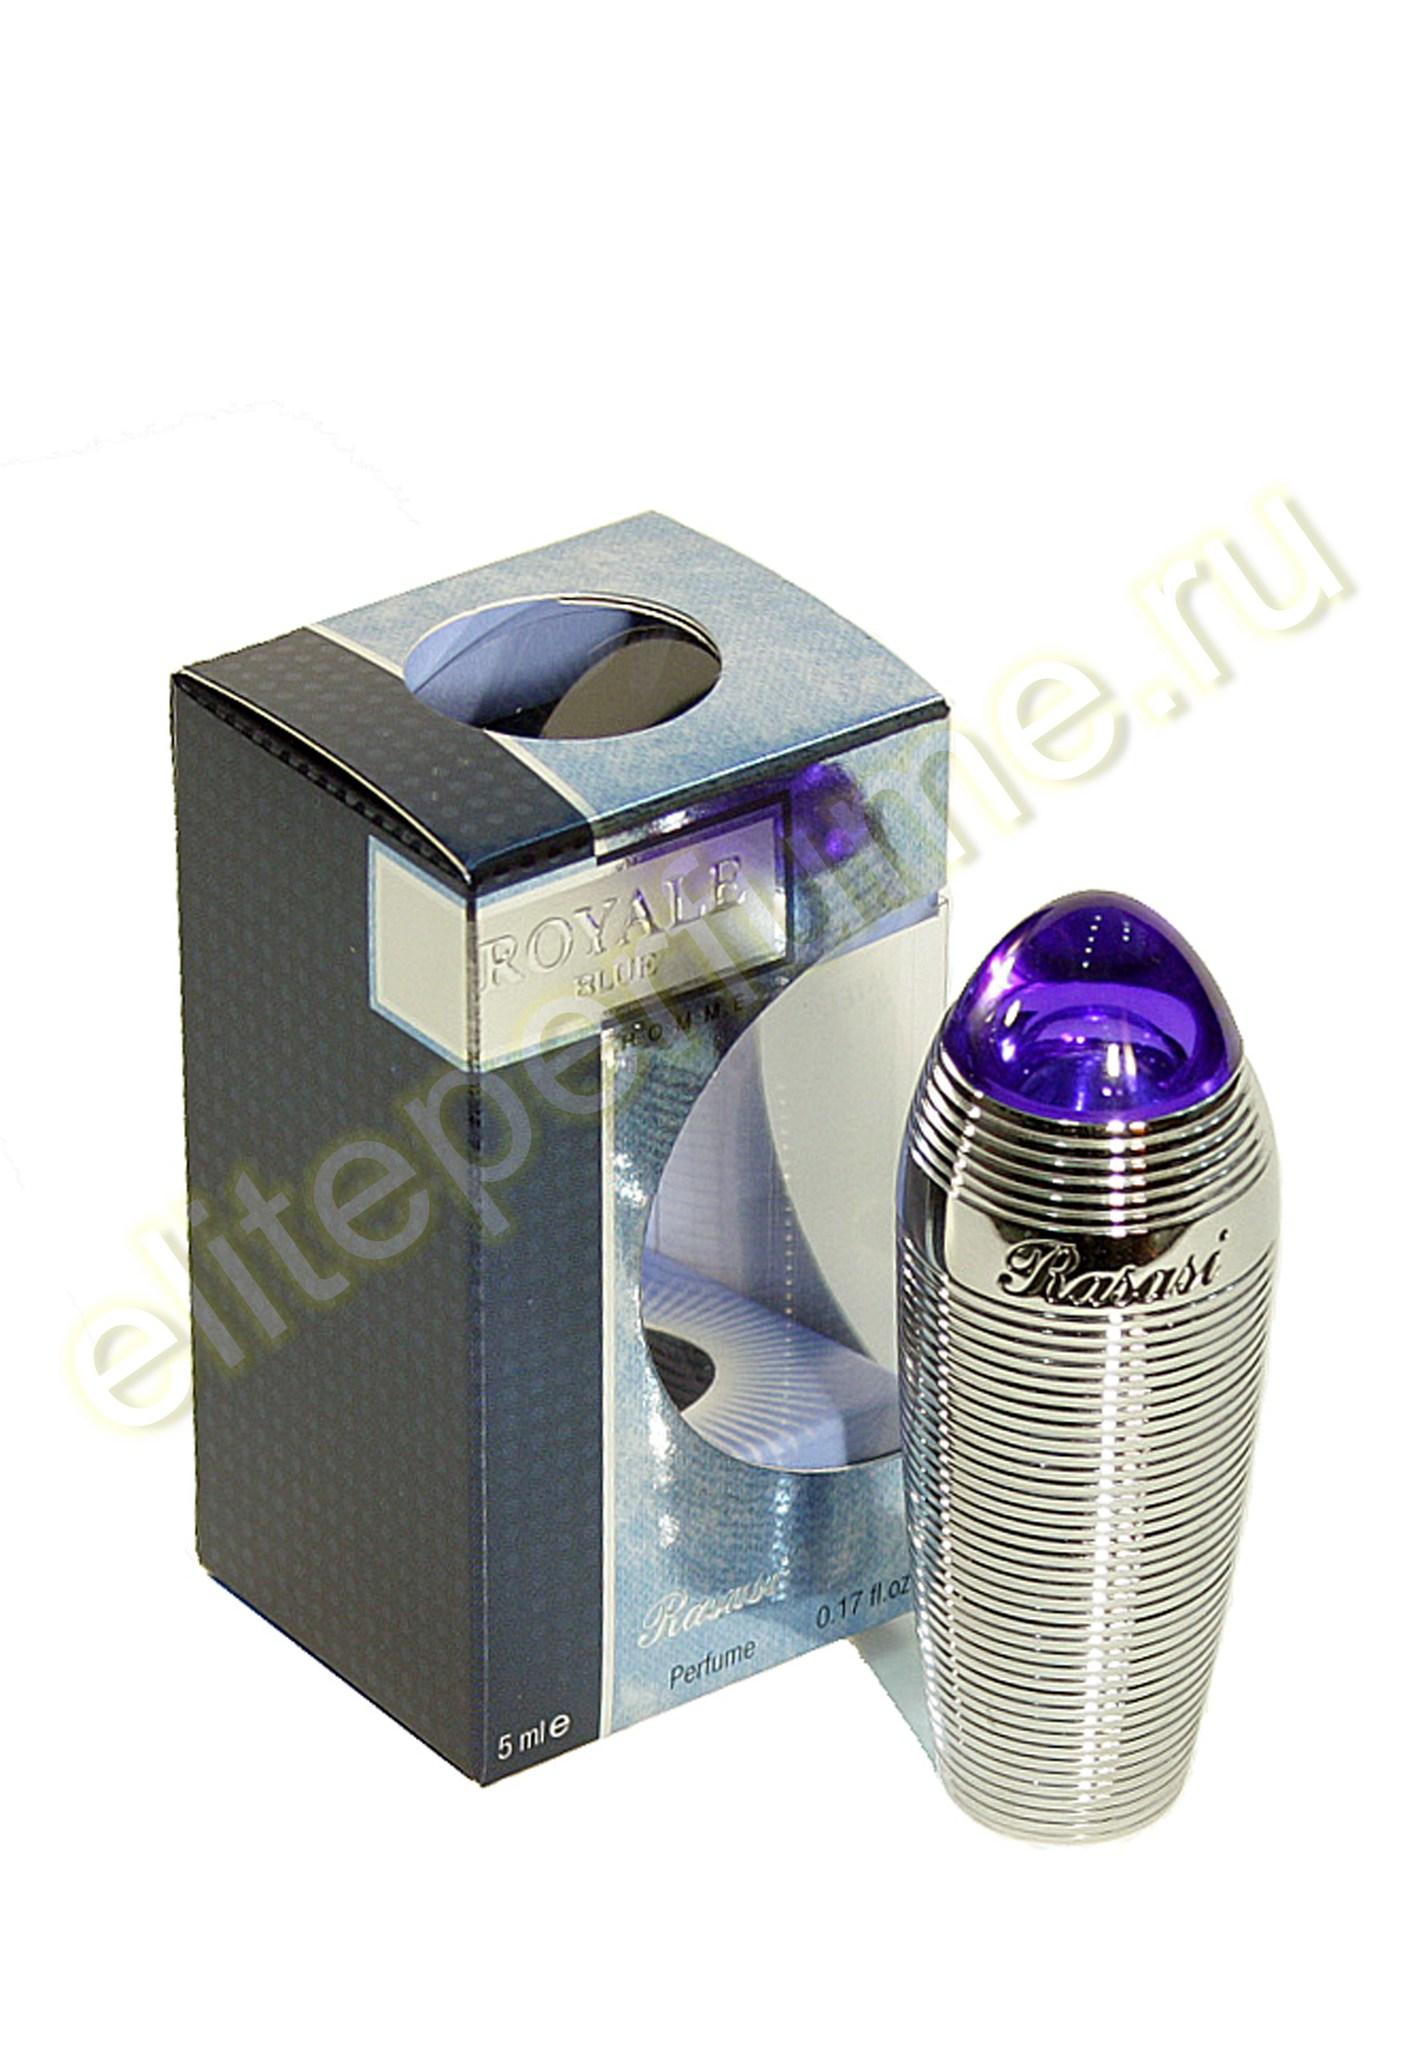 Синий  Royal Blue homme 5 мл арабские мужские масляные духи от Расаси Rasasi Perfumes